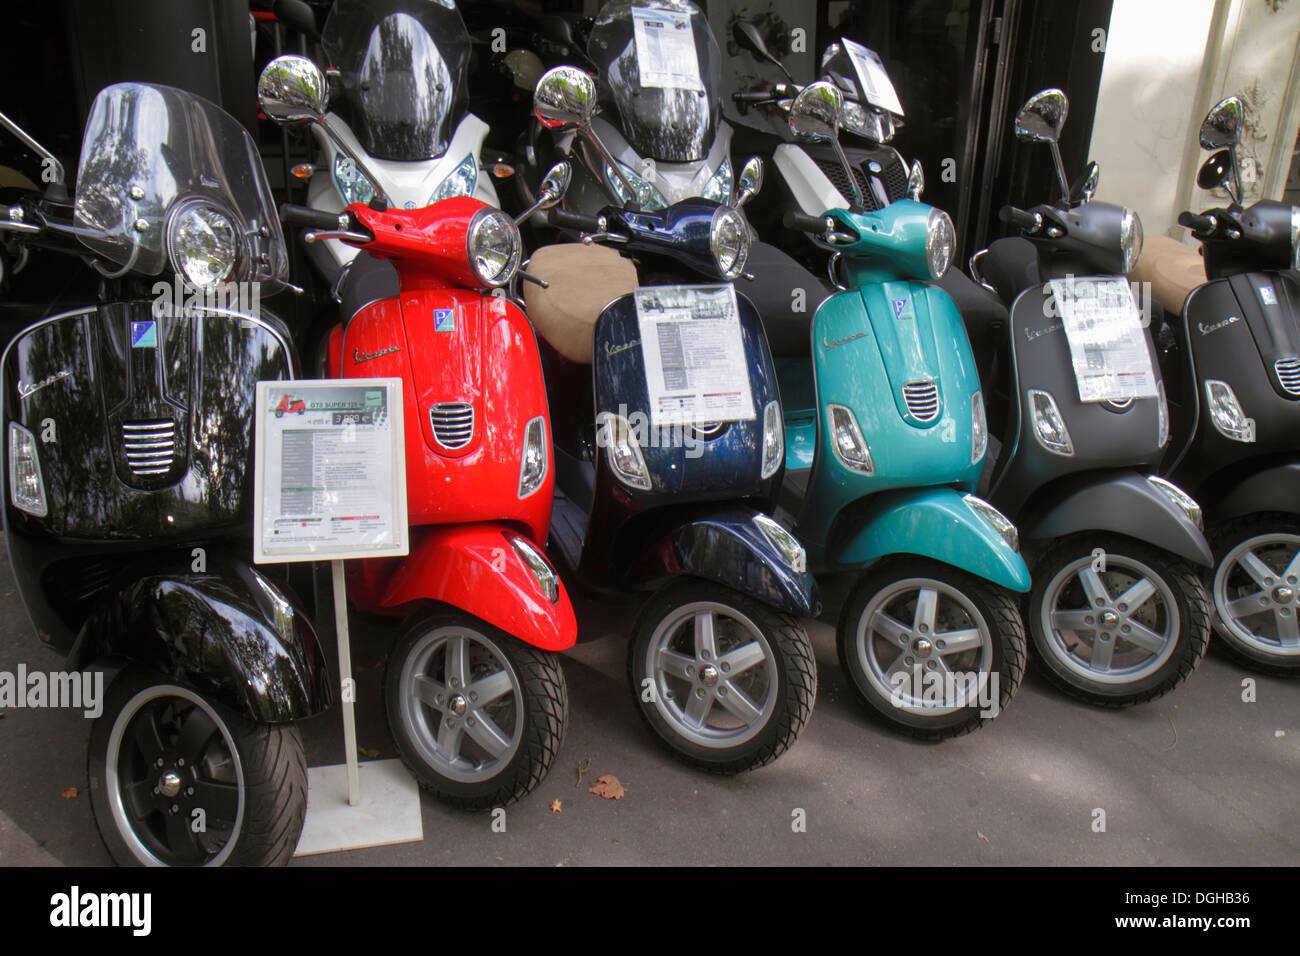 Paris France Europe French 4th arrondissement Boulevard de Sébastopol motor scooters new sale display Vespa - Stock Image